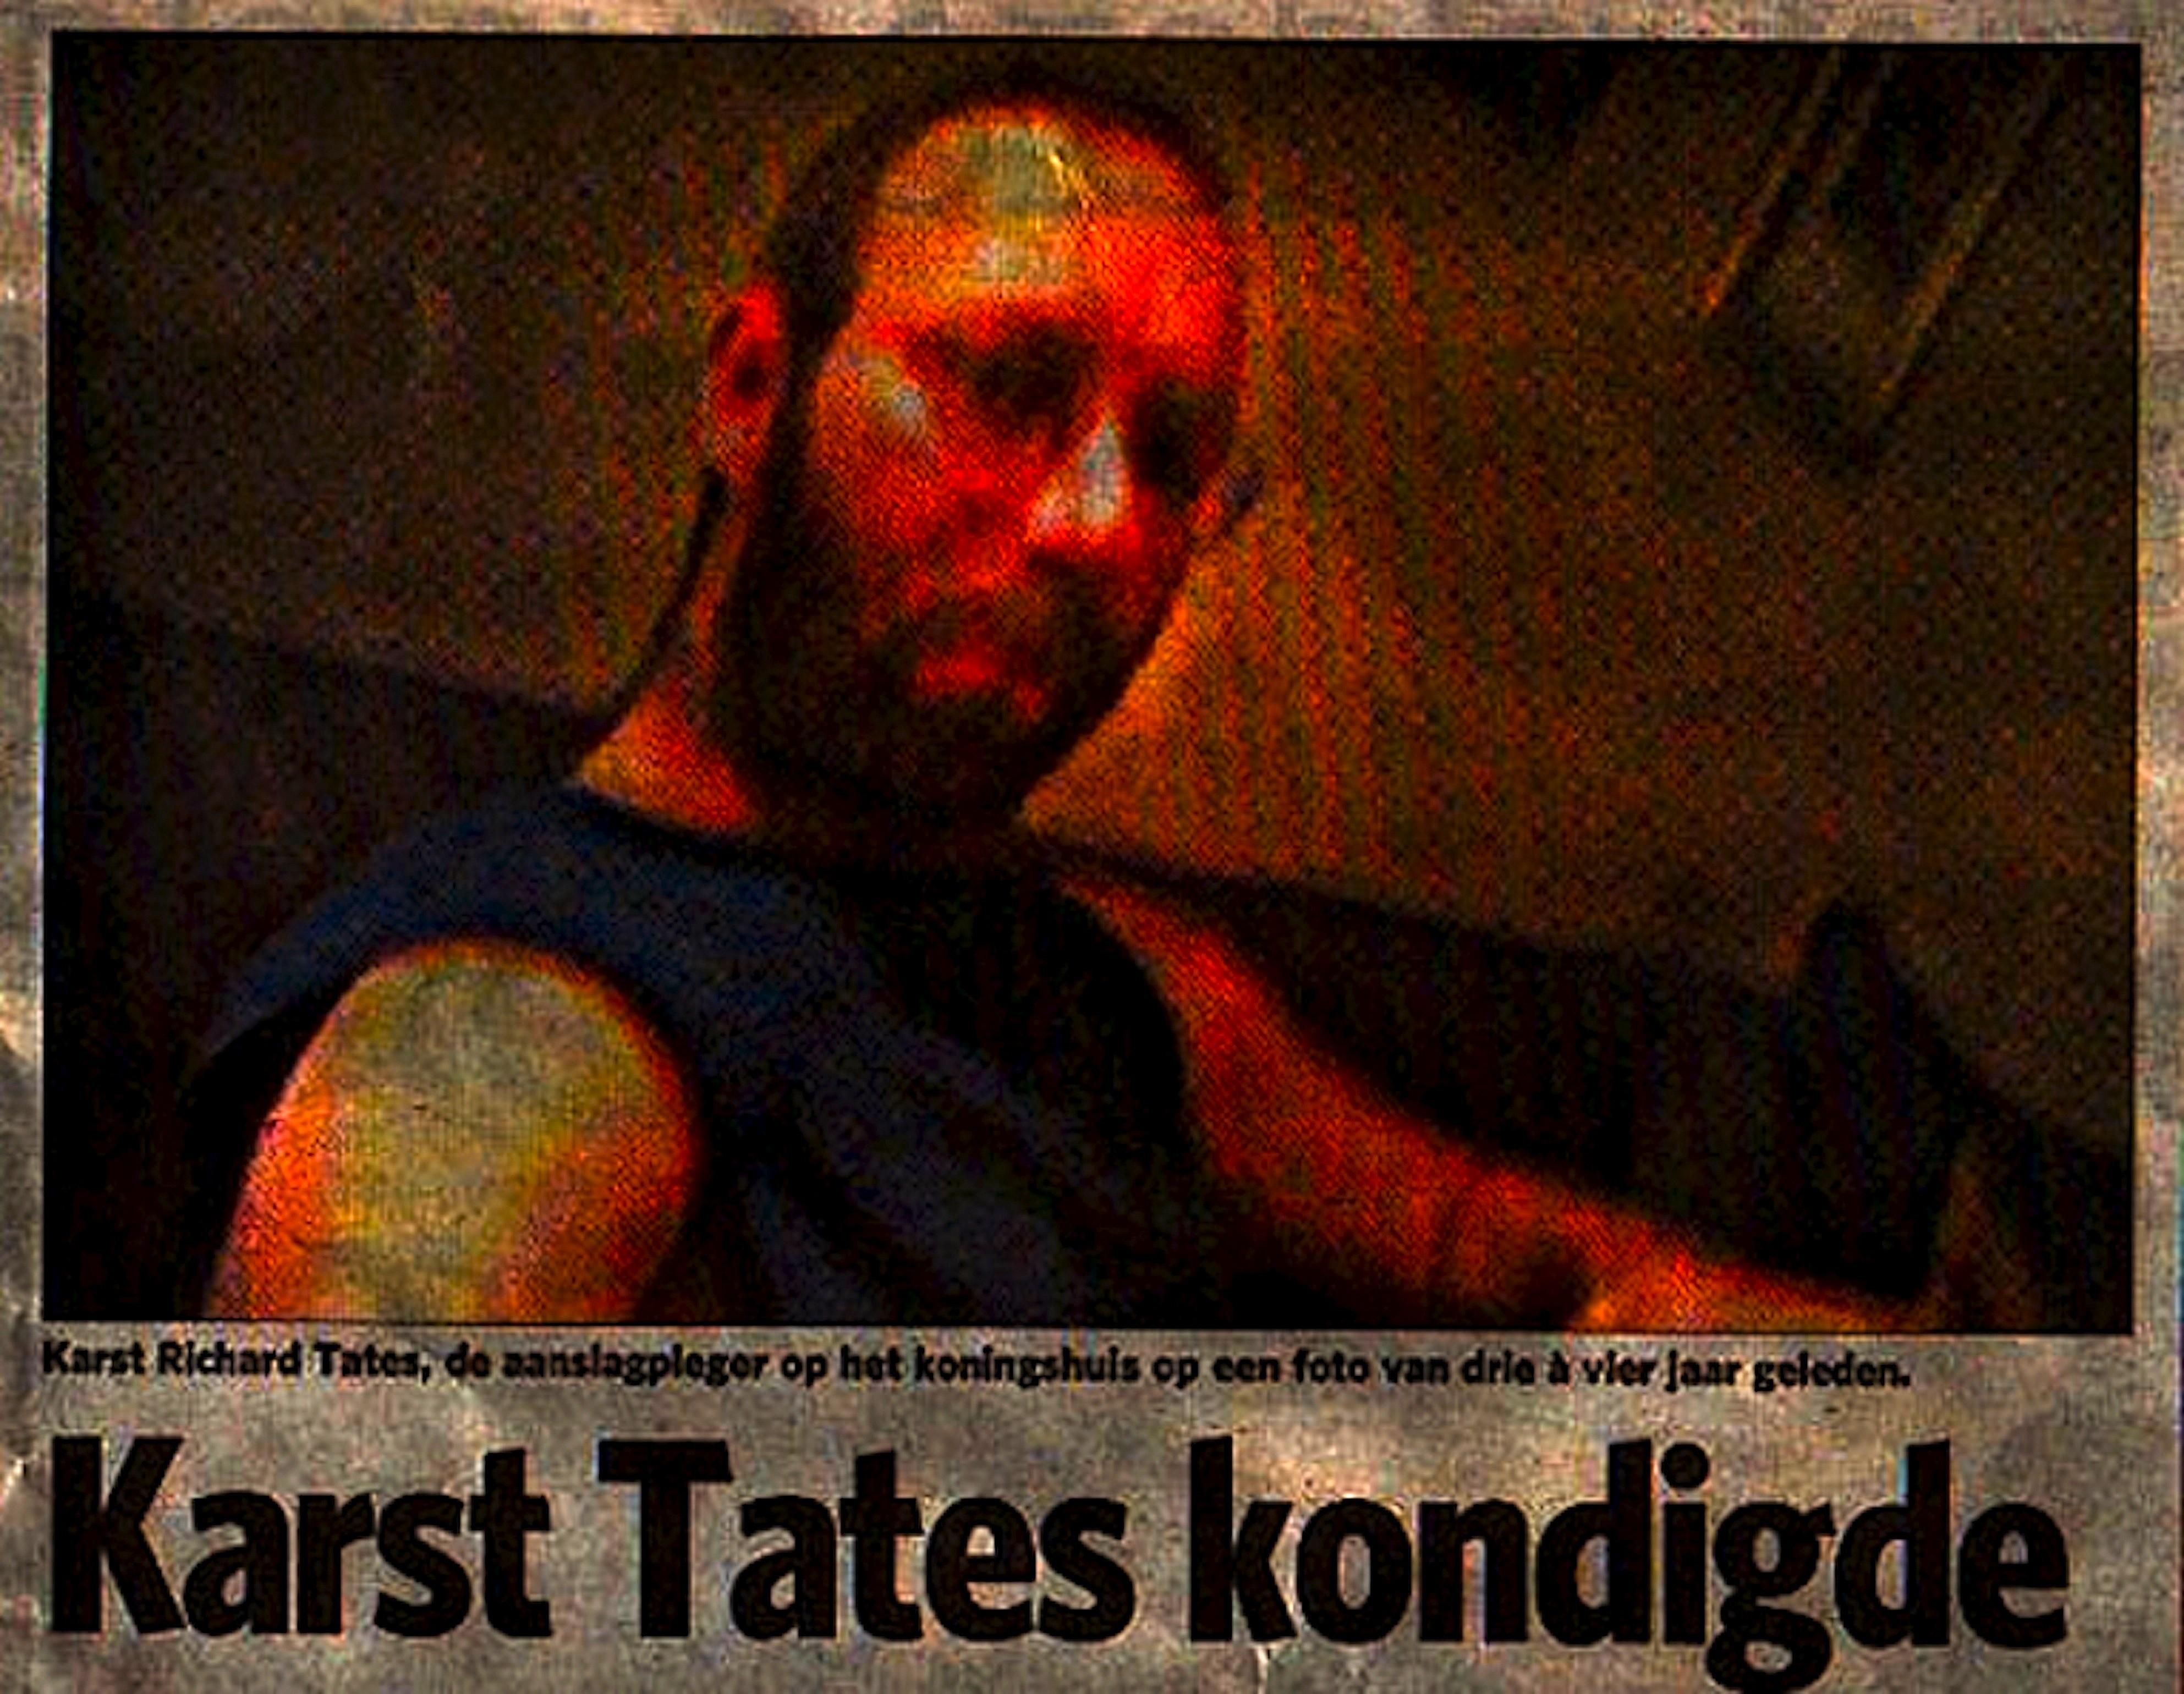 Karst Richard Tates, de aanslagpleger op het koningshuis (foto maxpam.nl)